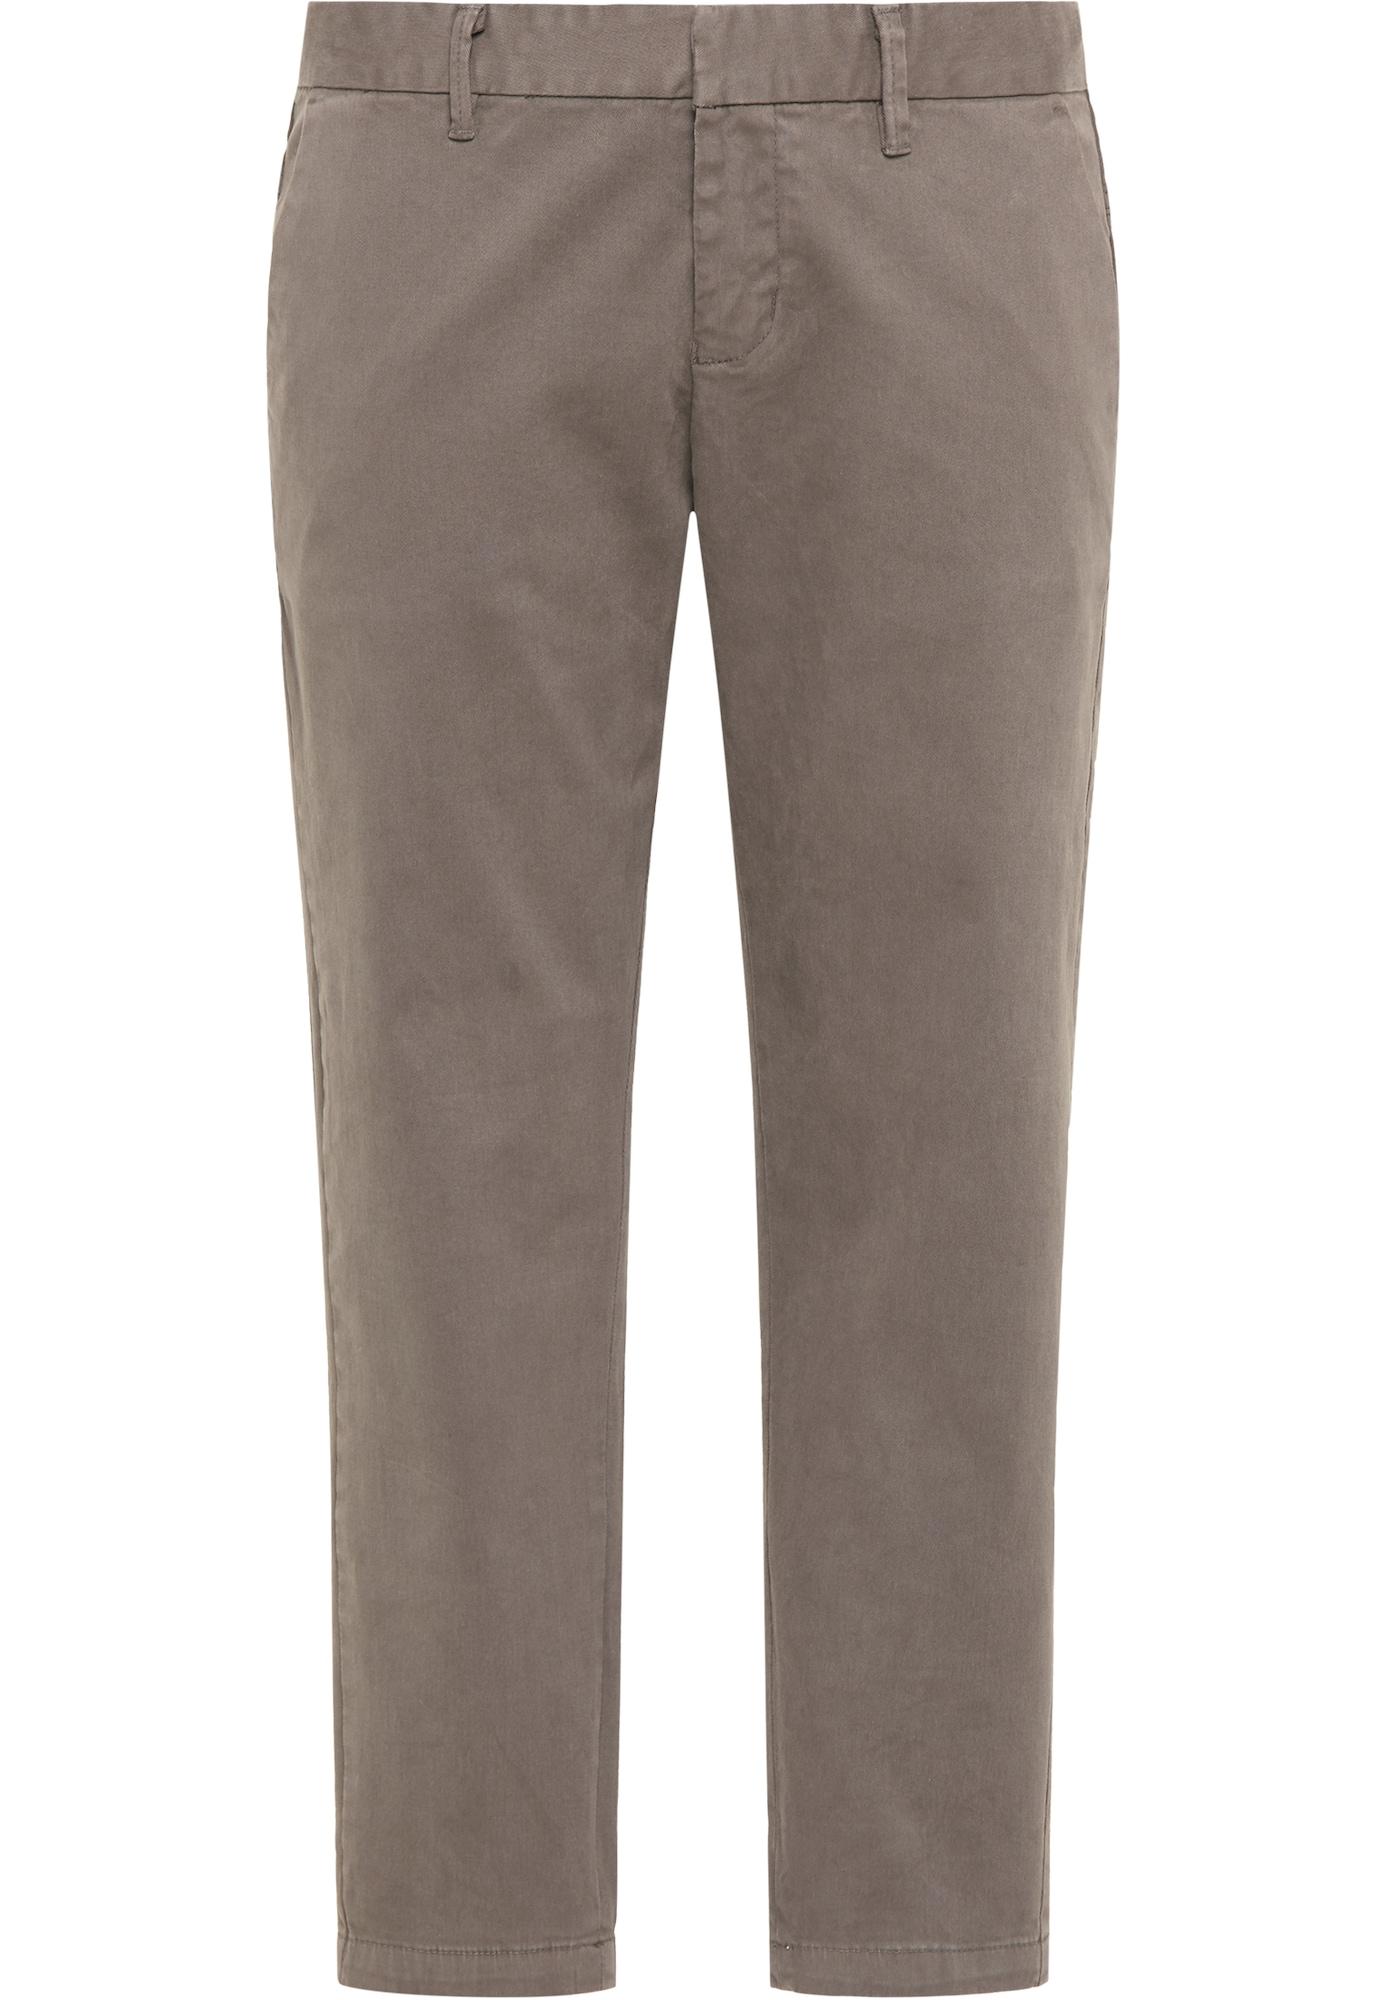 "DreiMaster Vintage ""Chino"" stiliaus kelnės brokato spalva"